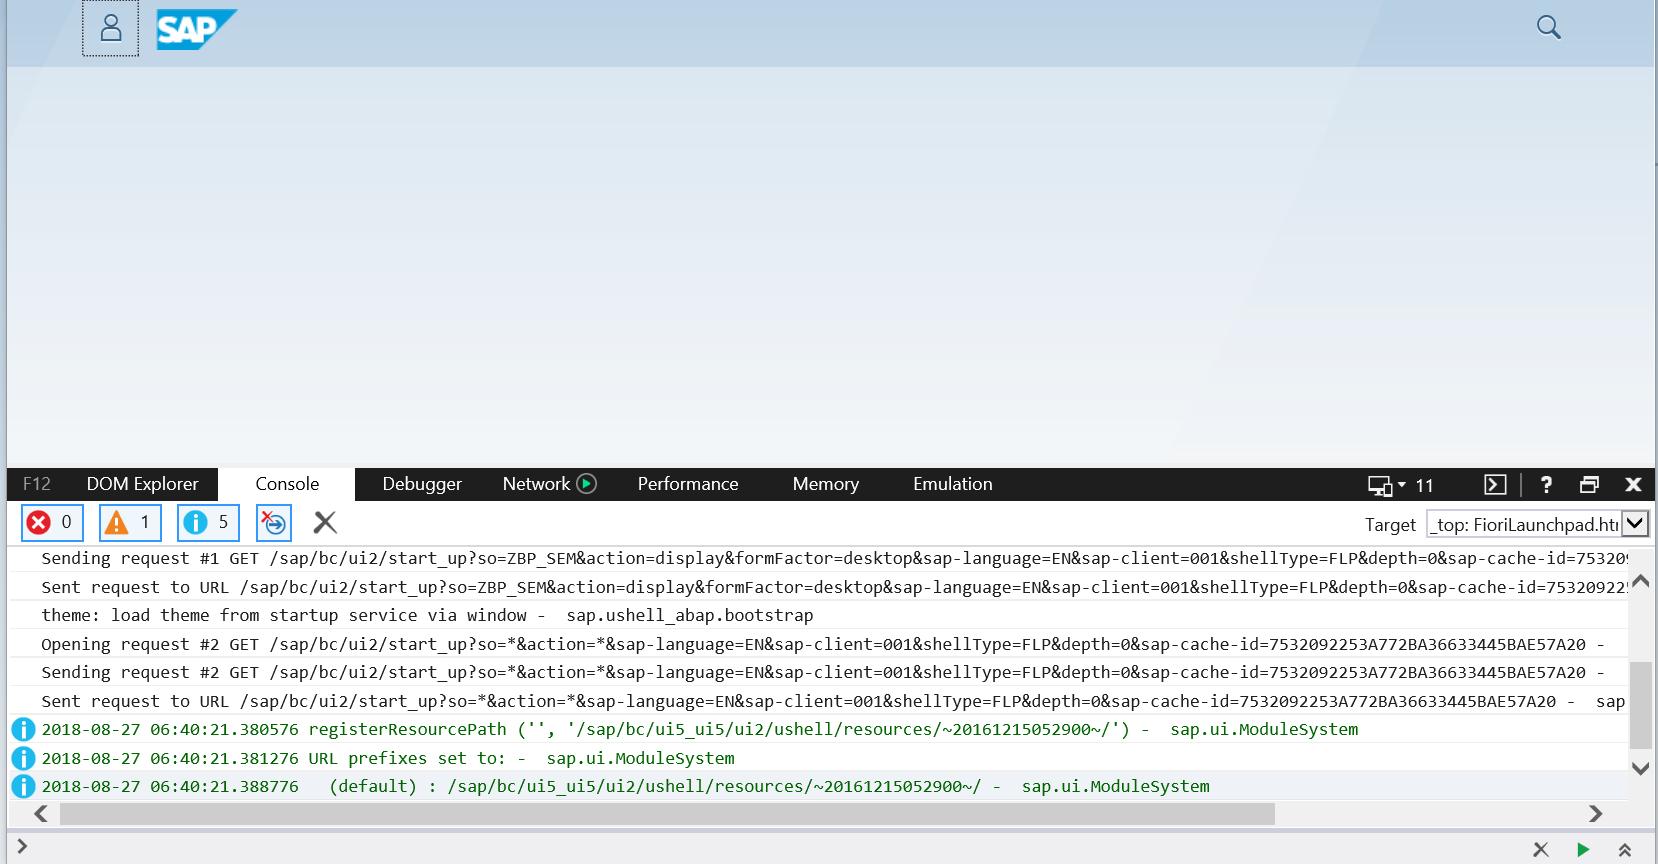 Fiori app configuration in SAP Fiori Launchpad | SAP Blogs